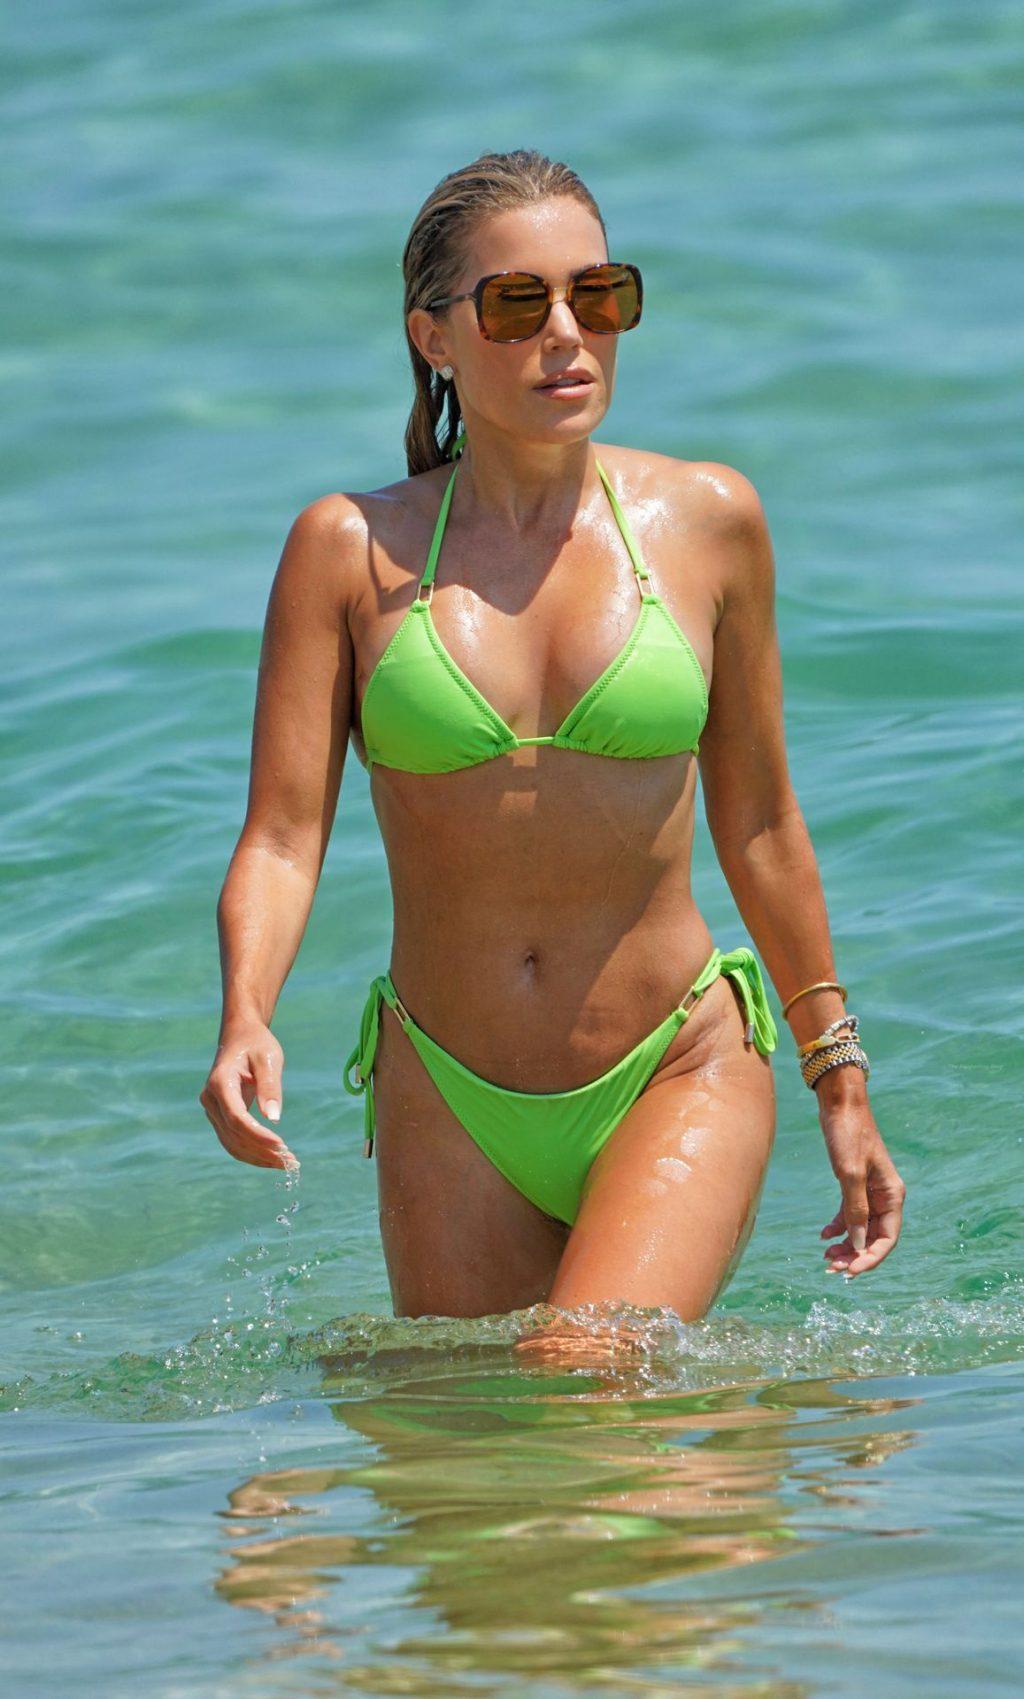 Sylvie Meis Enjoys a Day in a Green Bikini on the Beach in Saint Tropez (35 Photos)